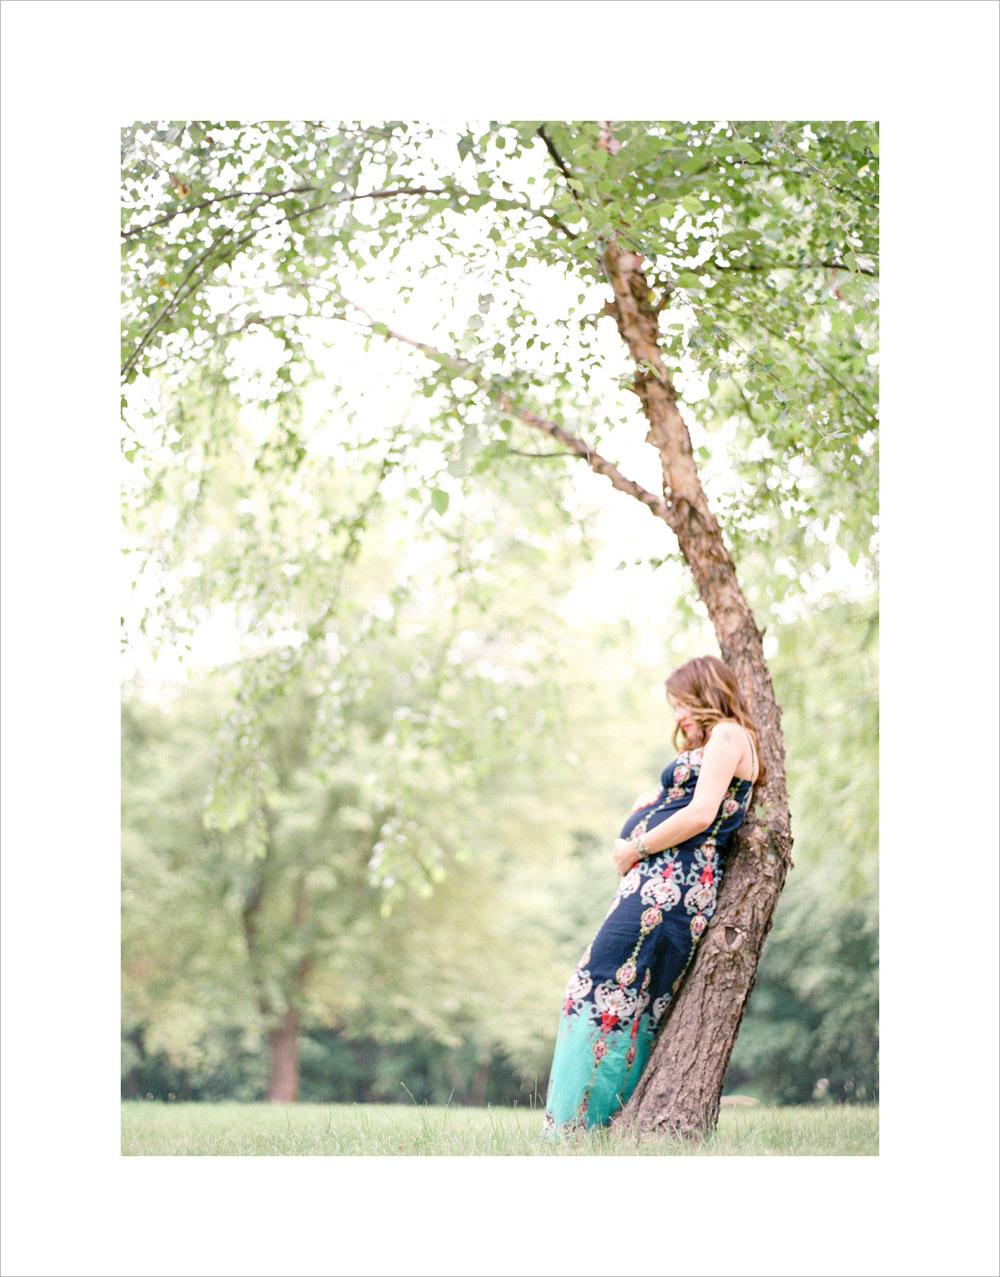 Eric-Yerke-Photography-2013-106.jpg